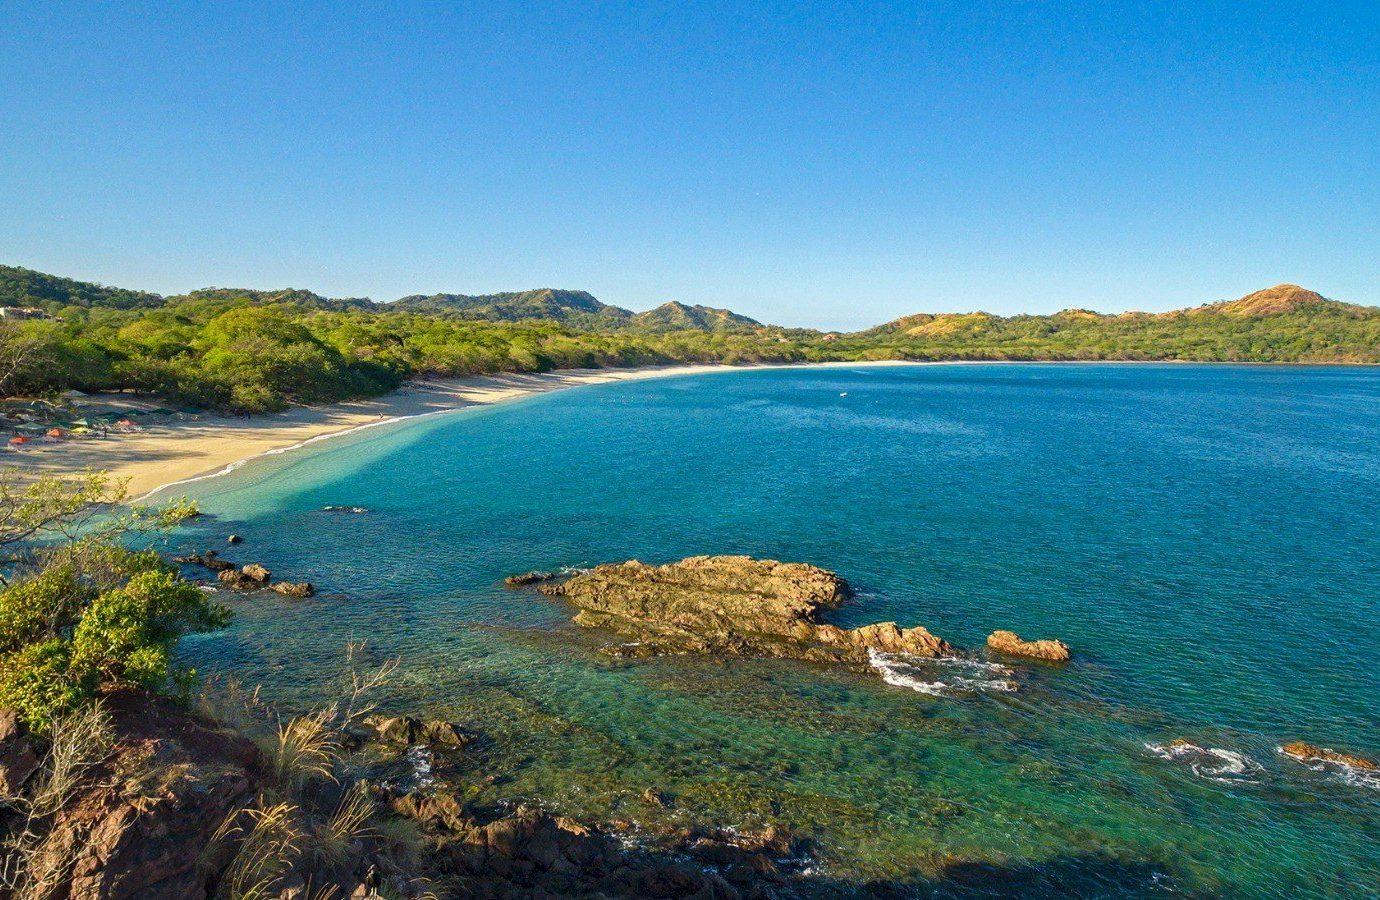 Playa Conchal beach in Costa Rica